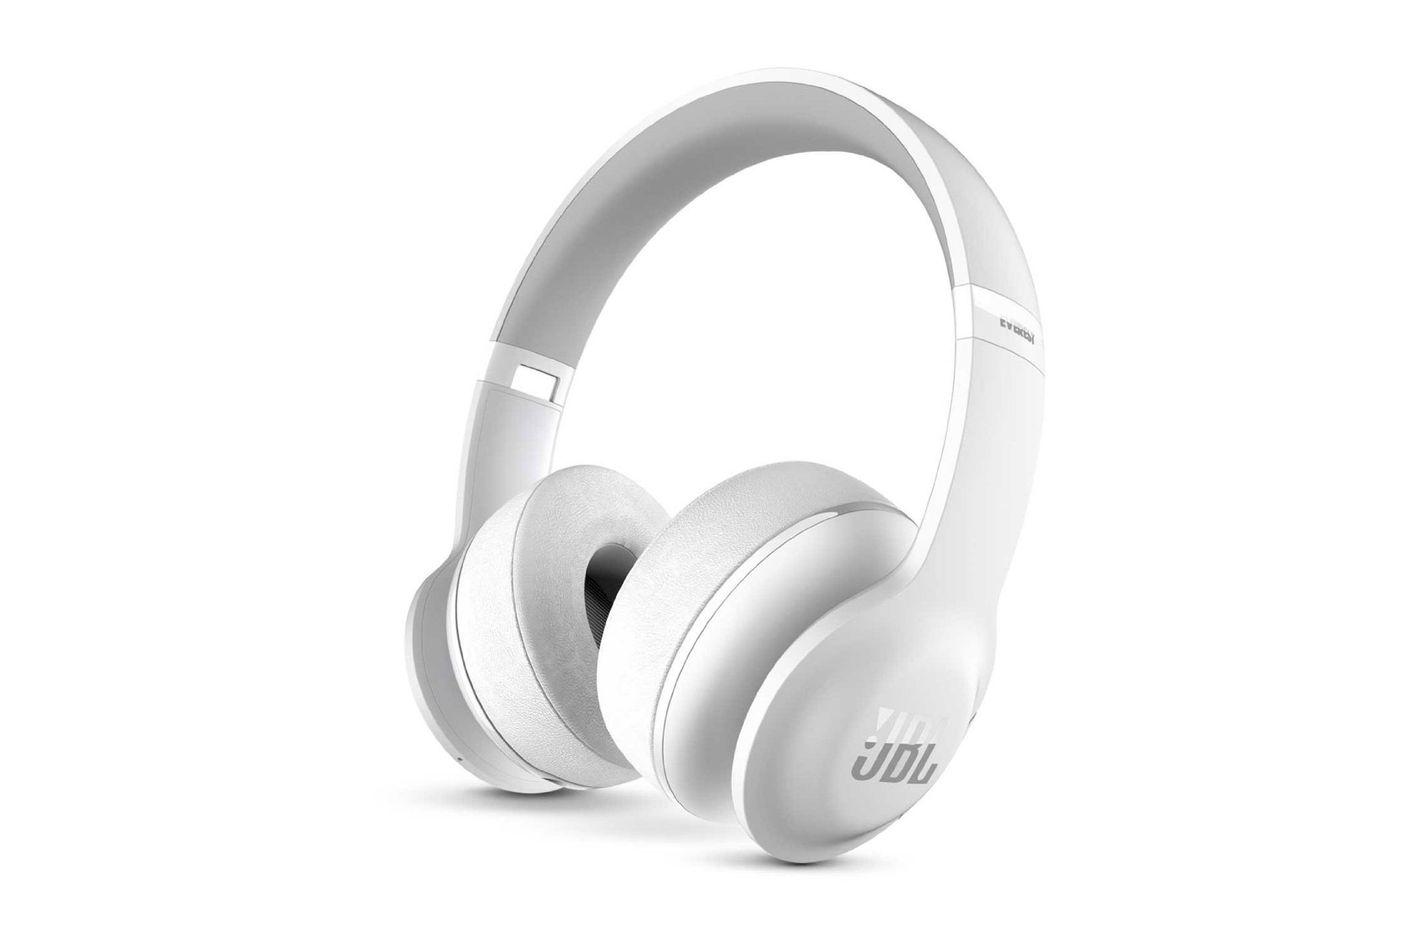 JBL Everest 300 Headphones